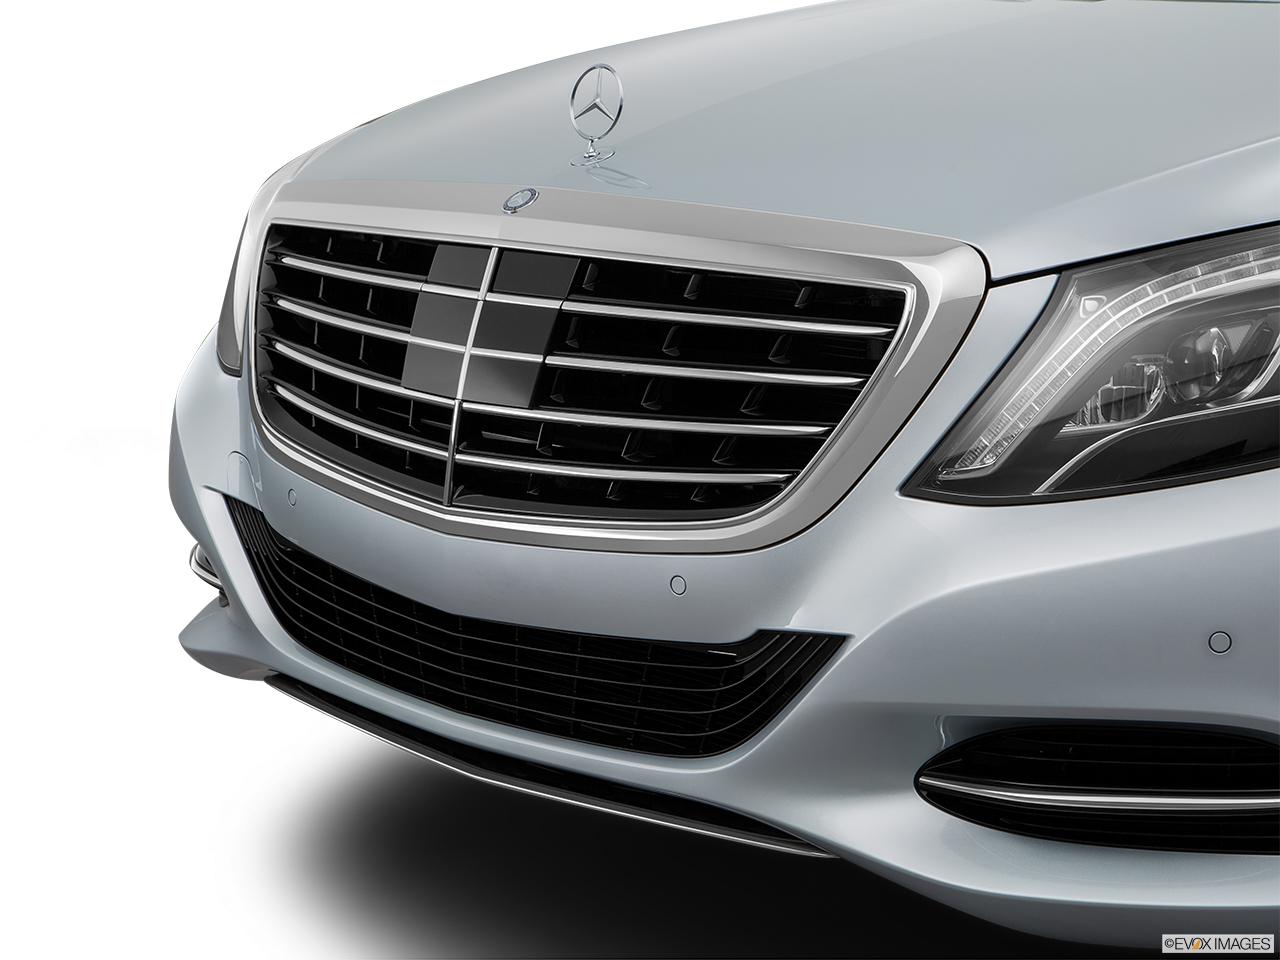 Car pictures list for mercedes benz s class 2016 s 600 l for Mercedes benz payment estimator